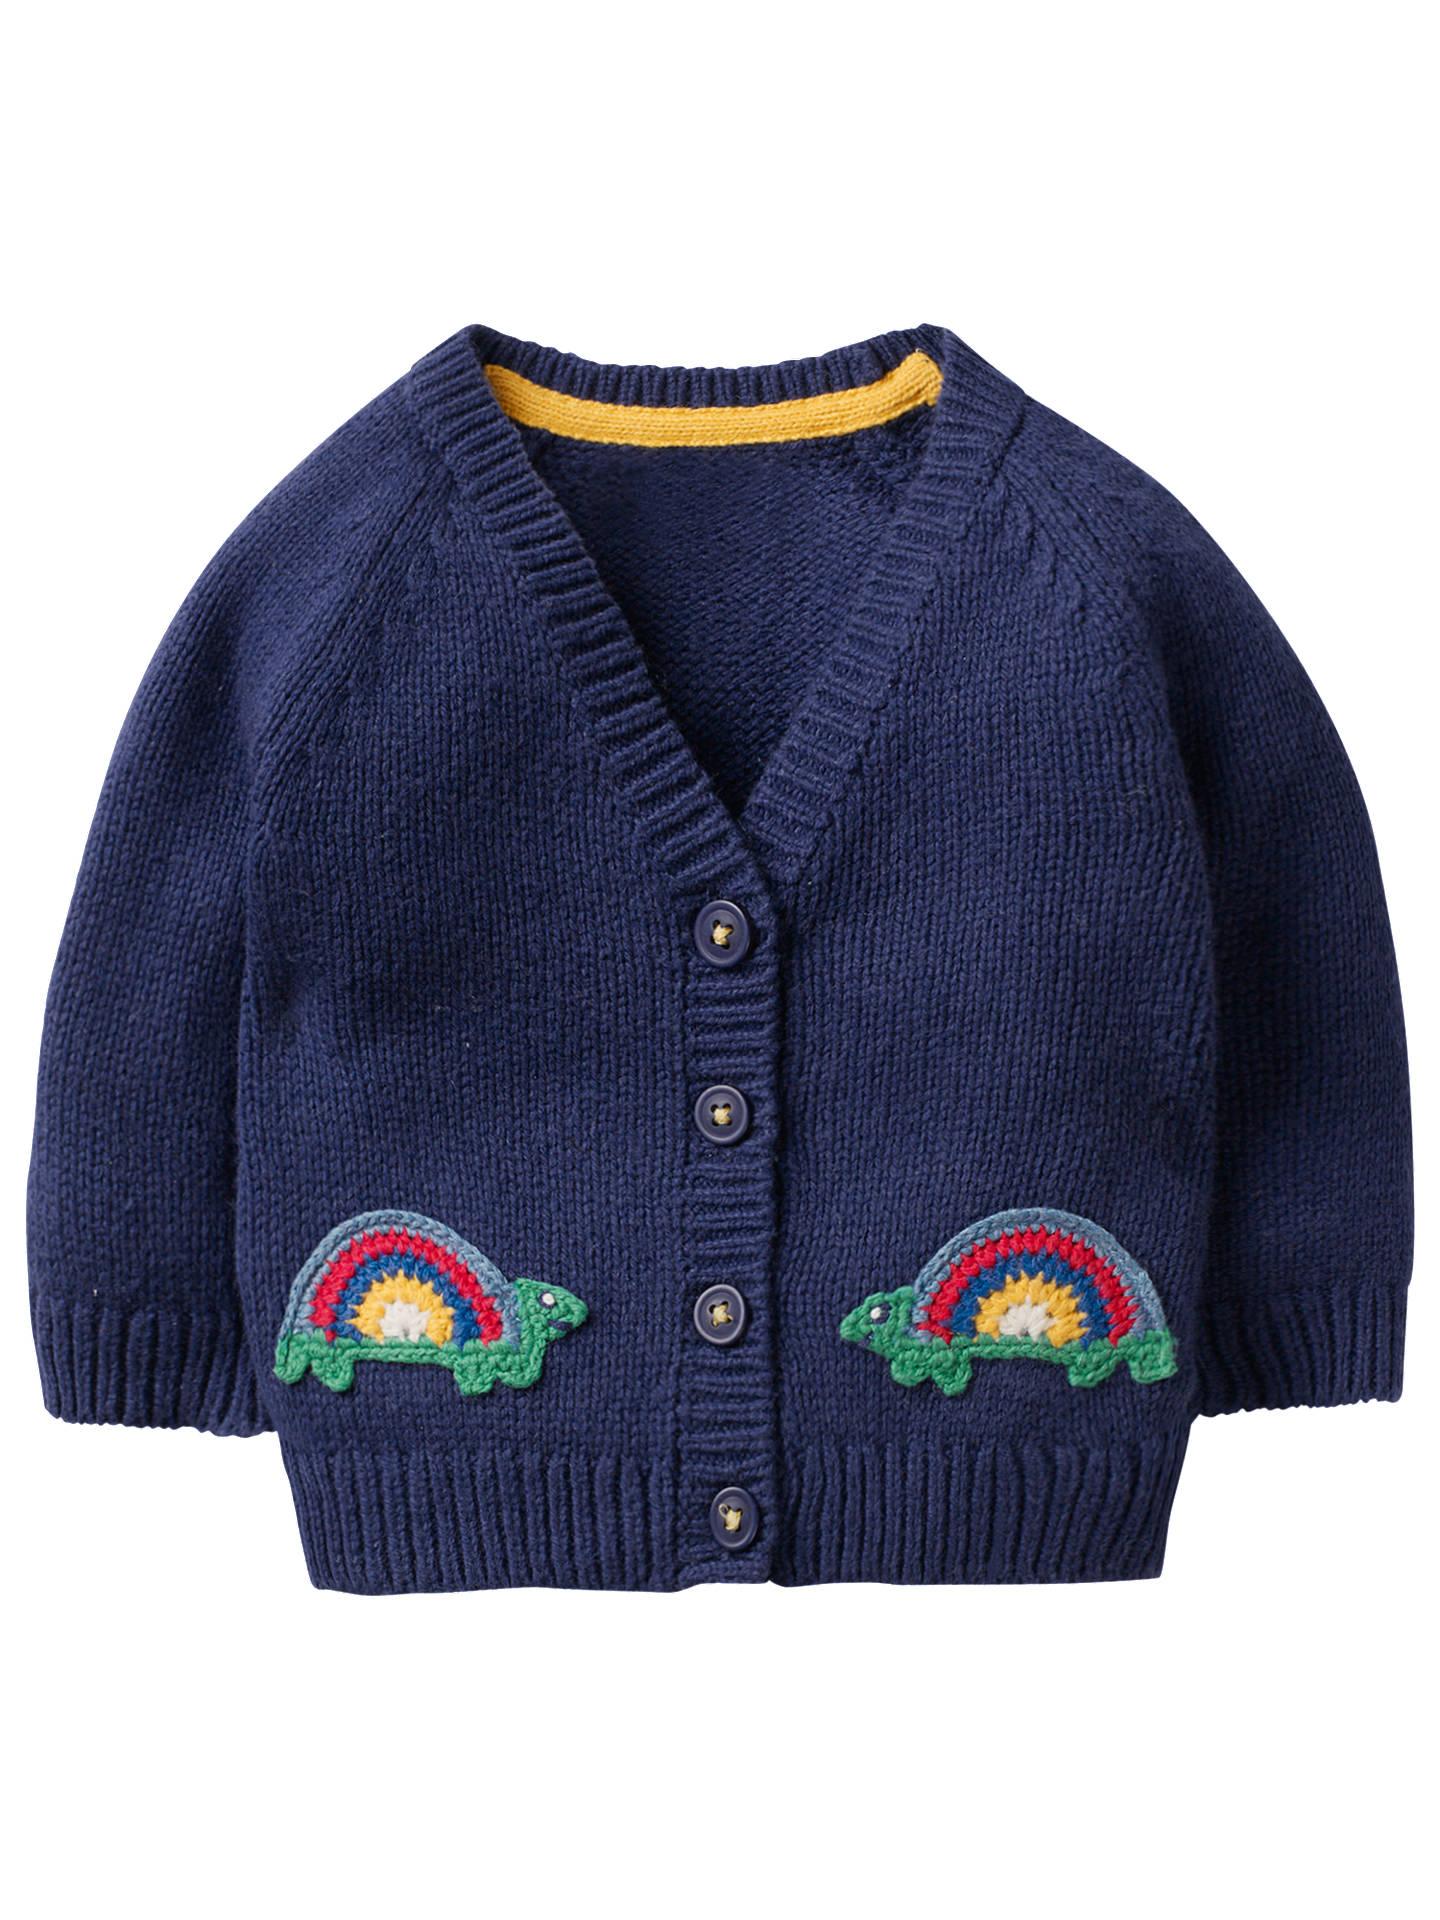 18 Boden 12 Rainbow months BuyMini Cardigan Baby Appilque Blue Turtle Beacon Crochet g7vHq6